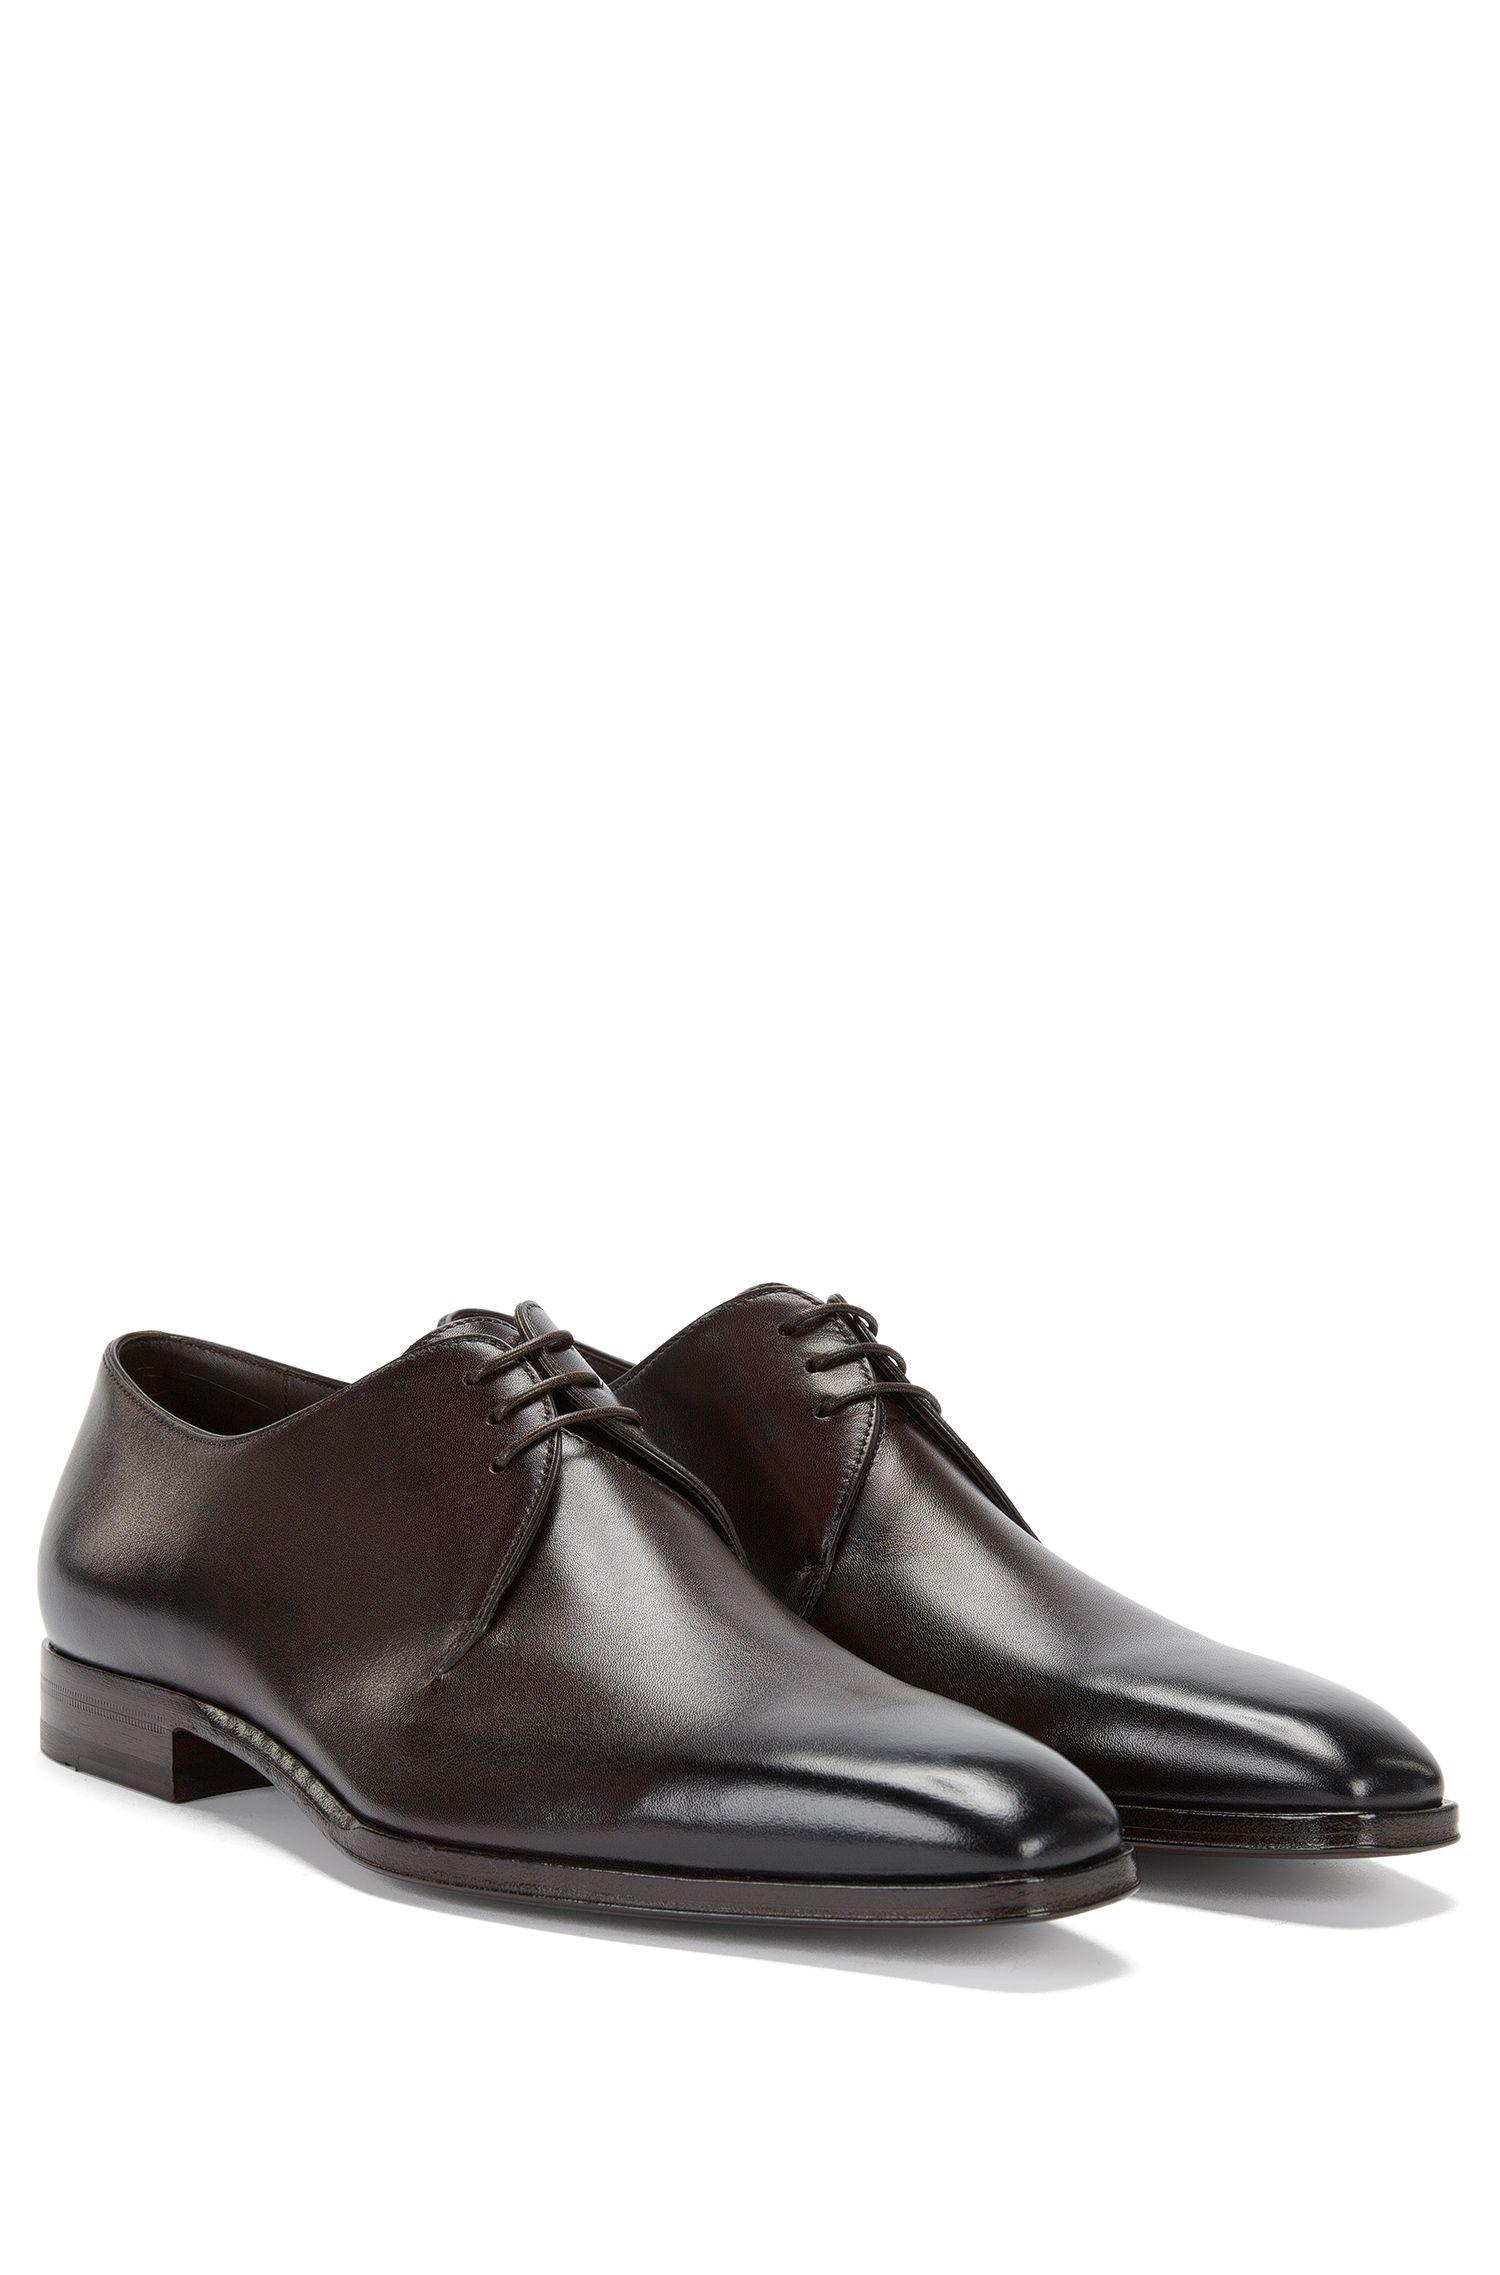 'T-Exders'   Italian Calfskin Derby Dress Shoes